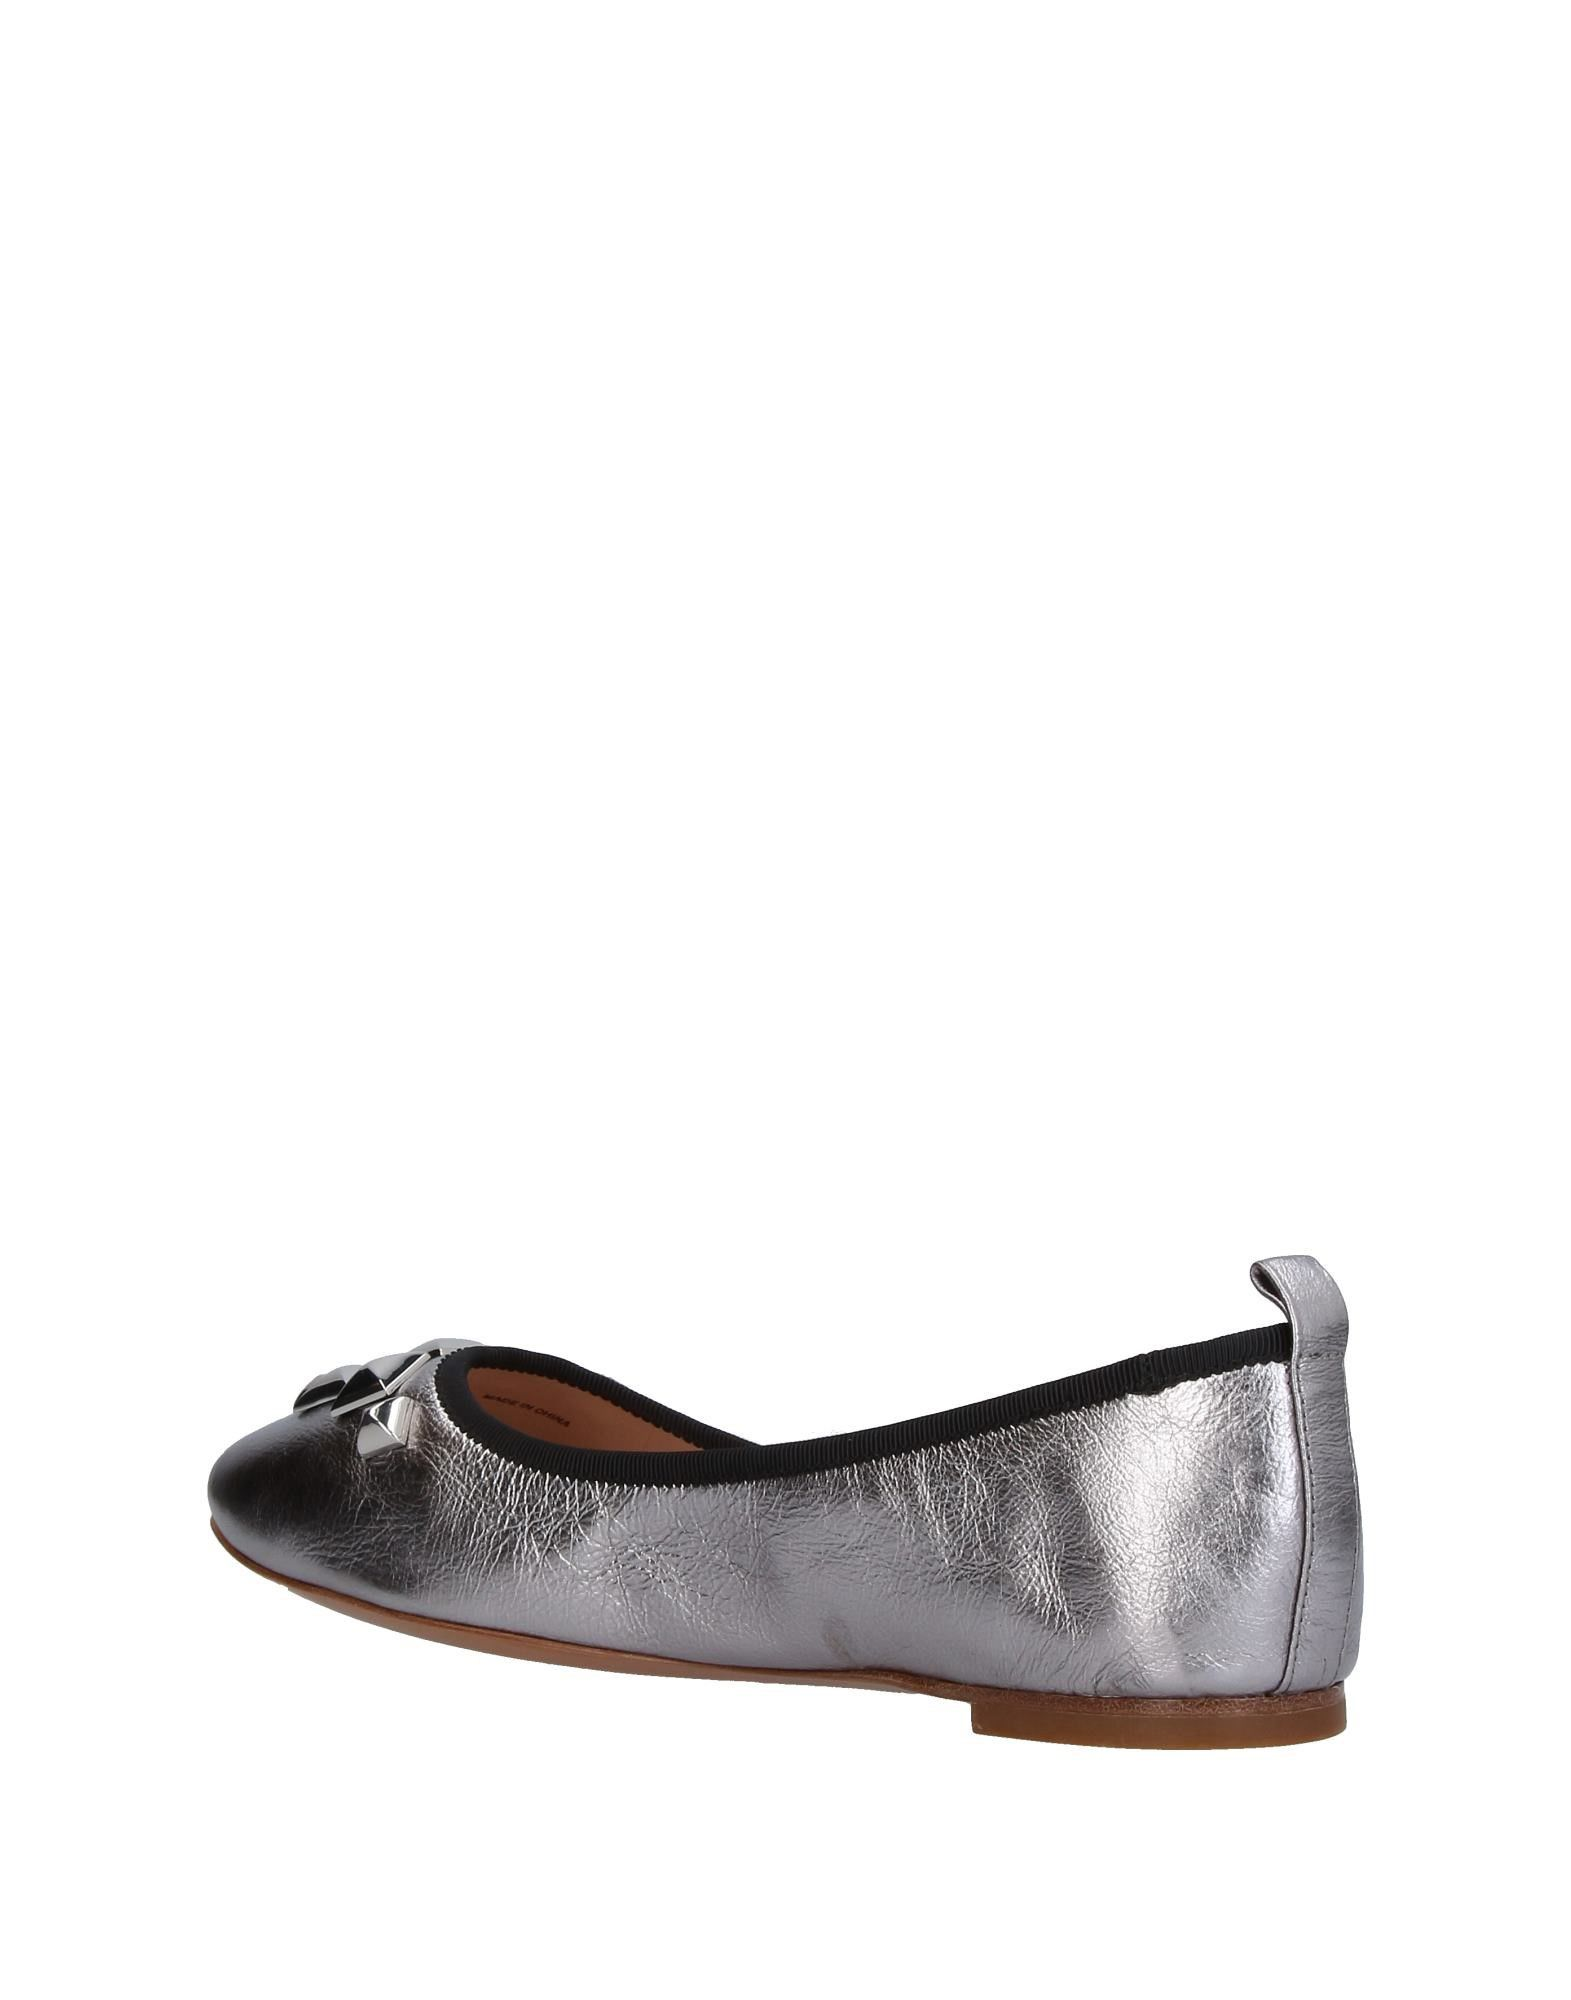 Stilvolle billige Schuhe Marc 11416931UN Jacobs Ballerinas Damen  11416931UN Marc 2f070c